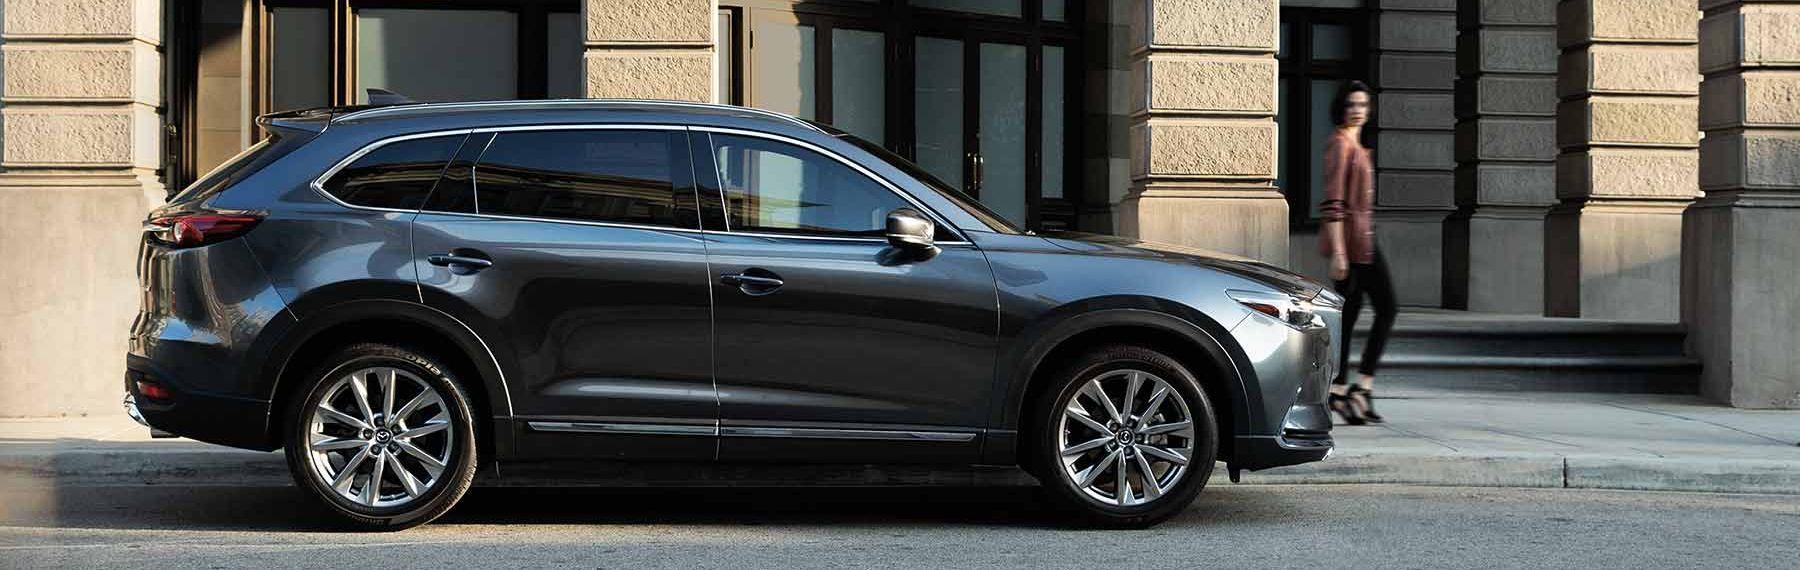 2019 Mazda CX-9 for Sale near Valley Stream, NY